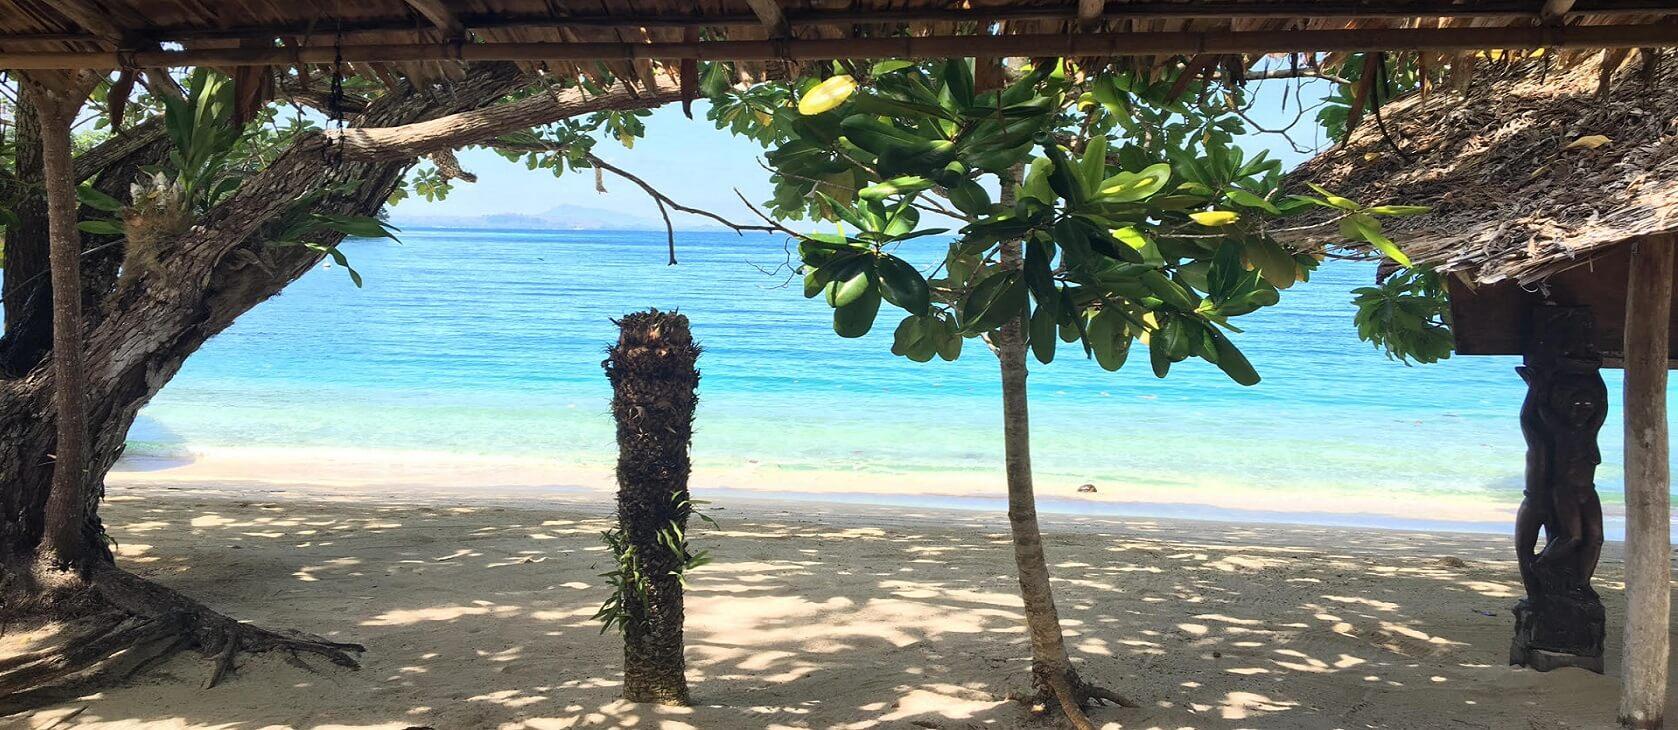 Solomon Islands Nugu beach Resort travel destinations-1